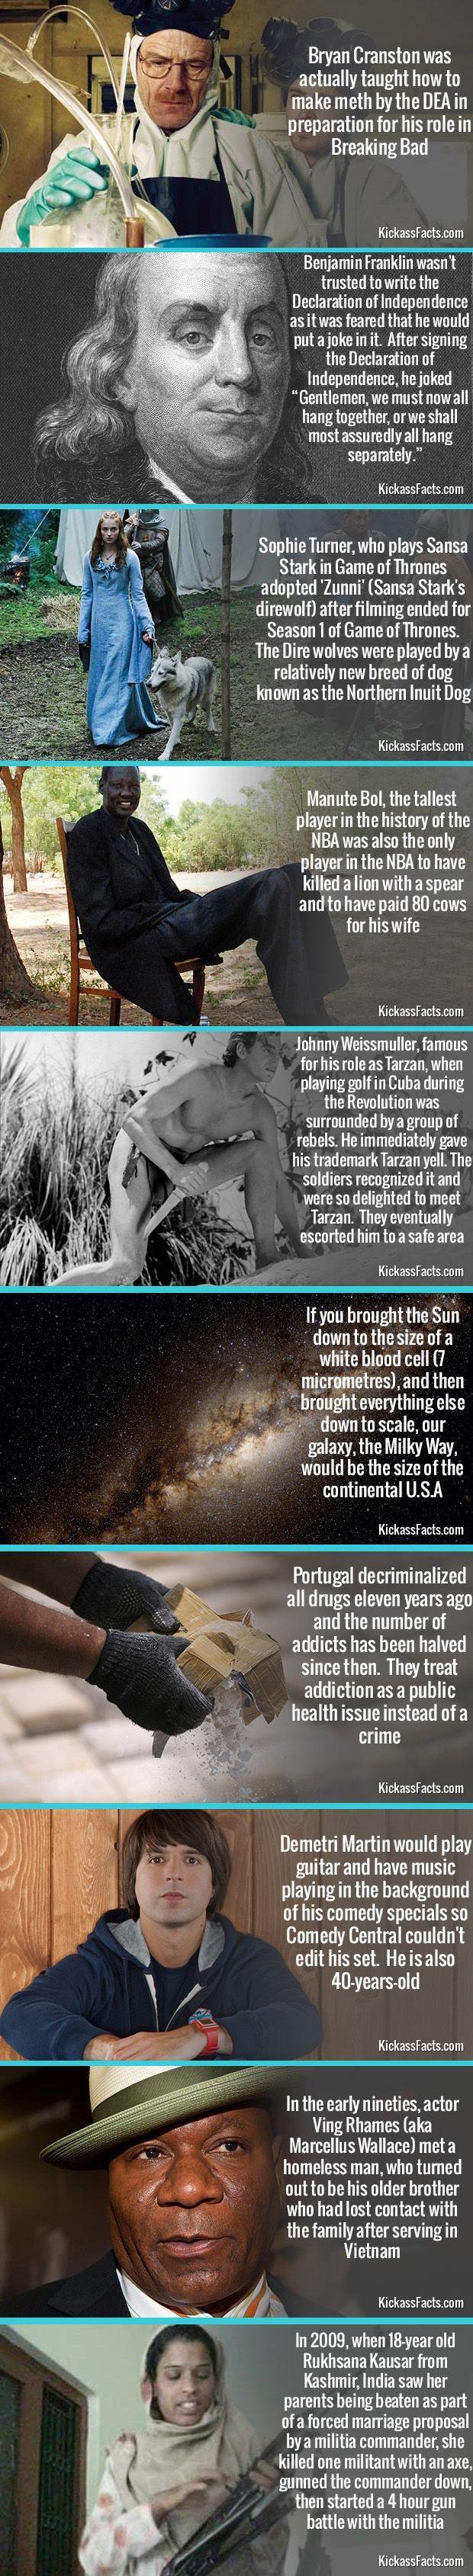 10 More Random Interesting Facts